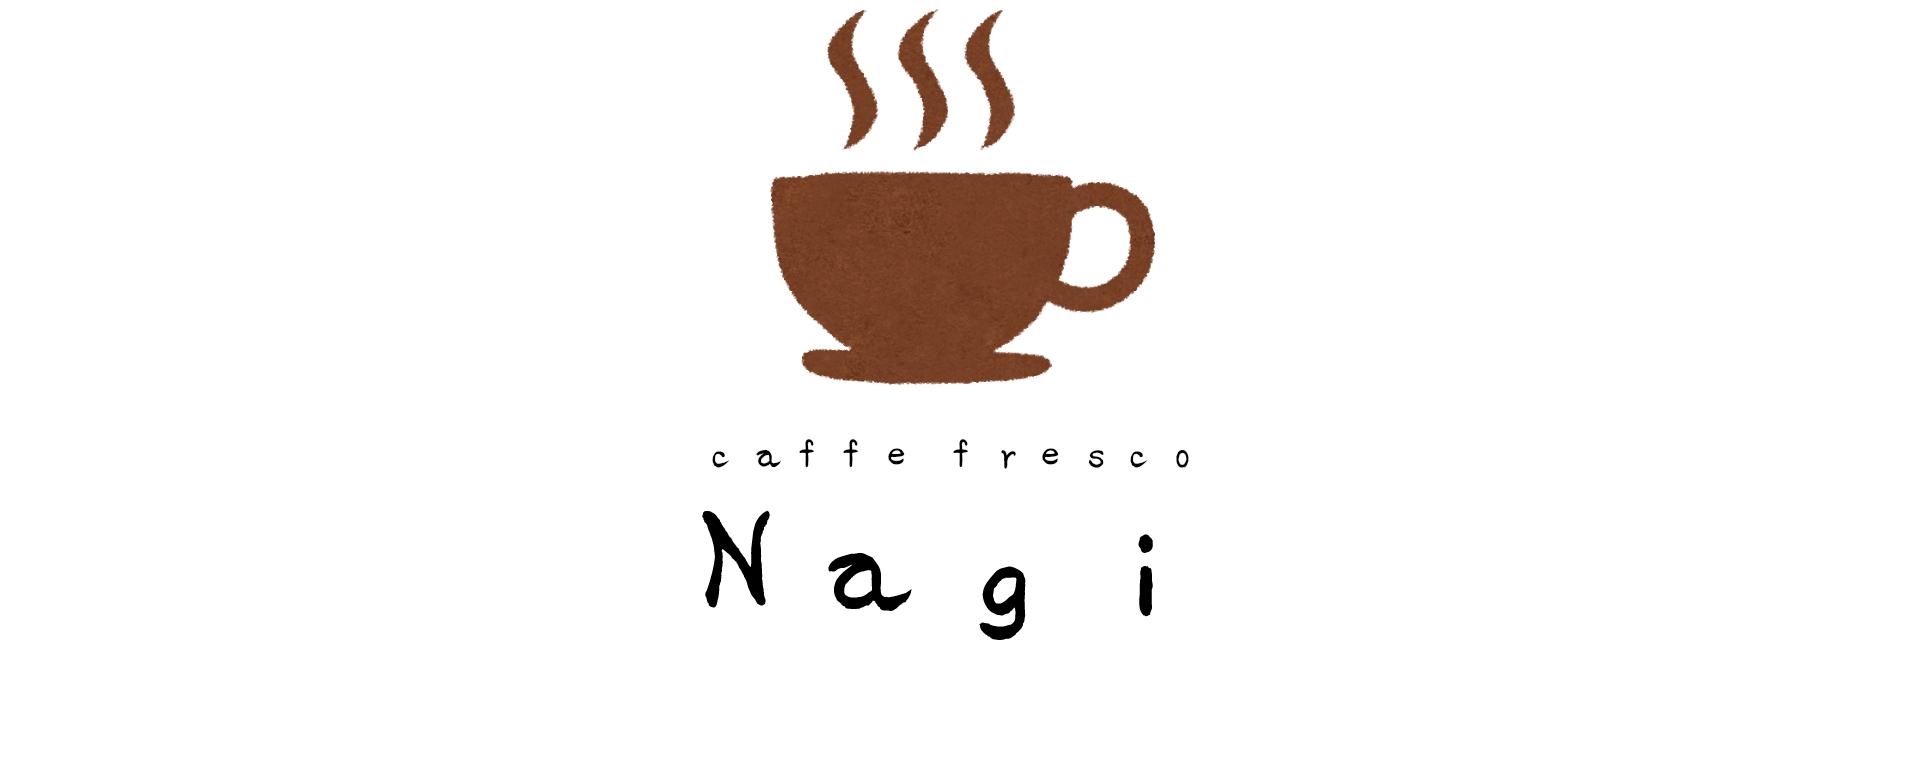 caffe fresco nagi (カフェフレスコ ナギ)広島市西区にあるコーヒーの家庭焙煎教室